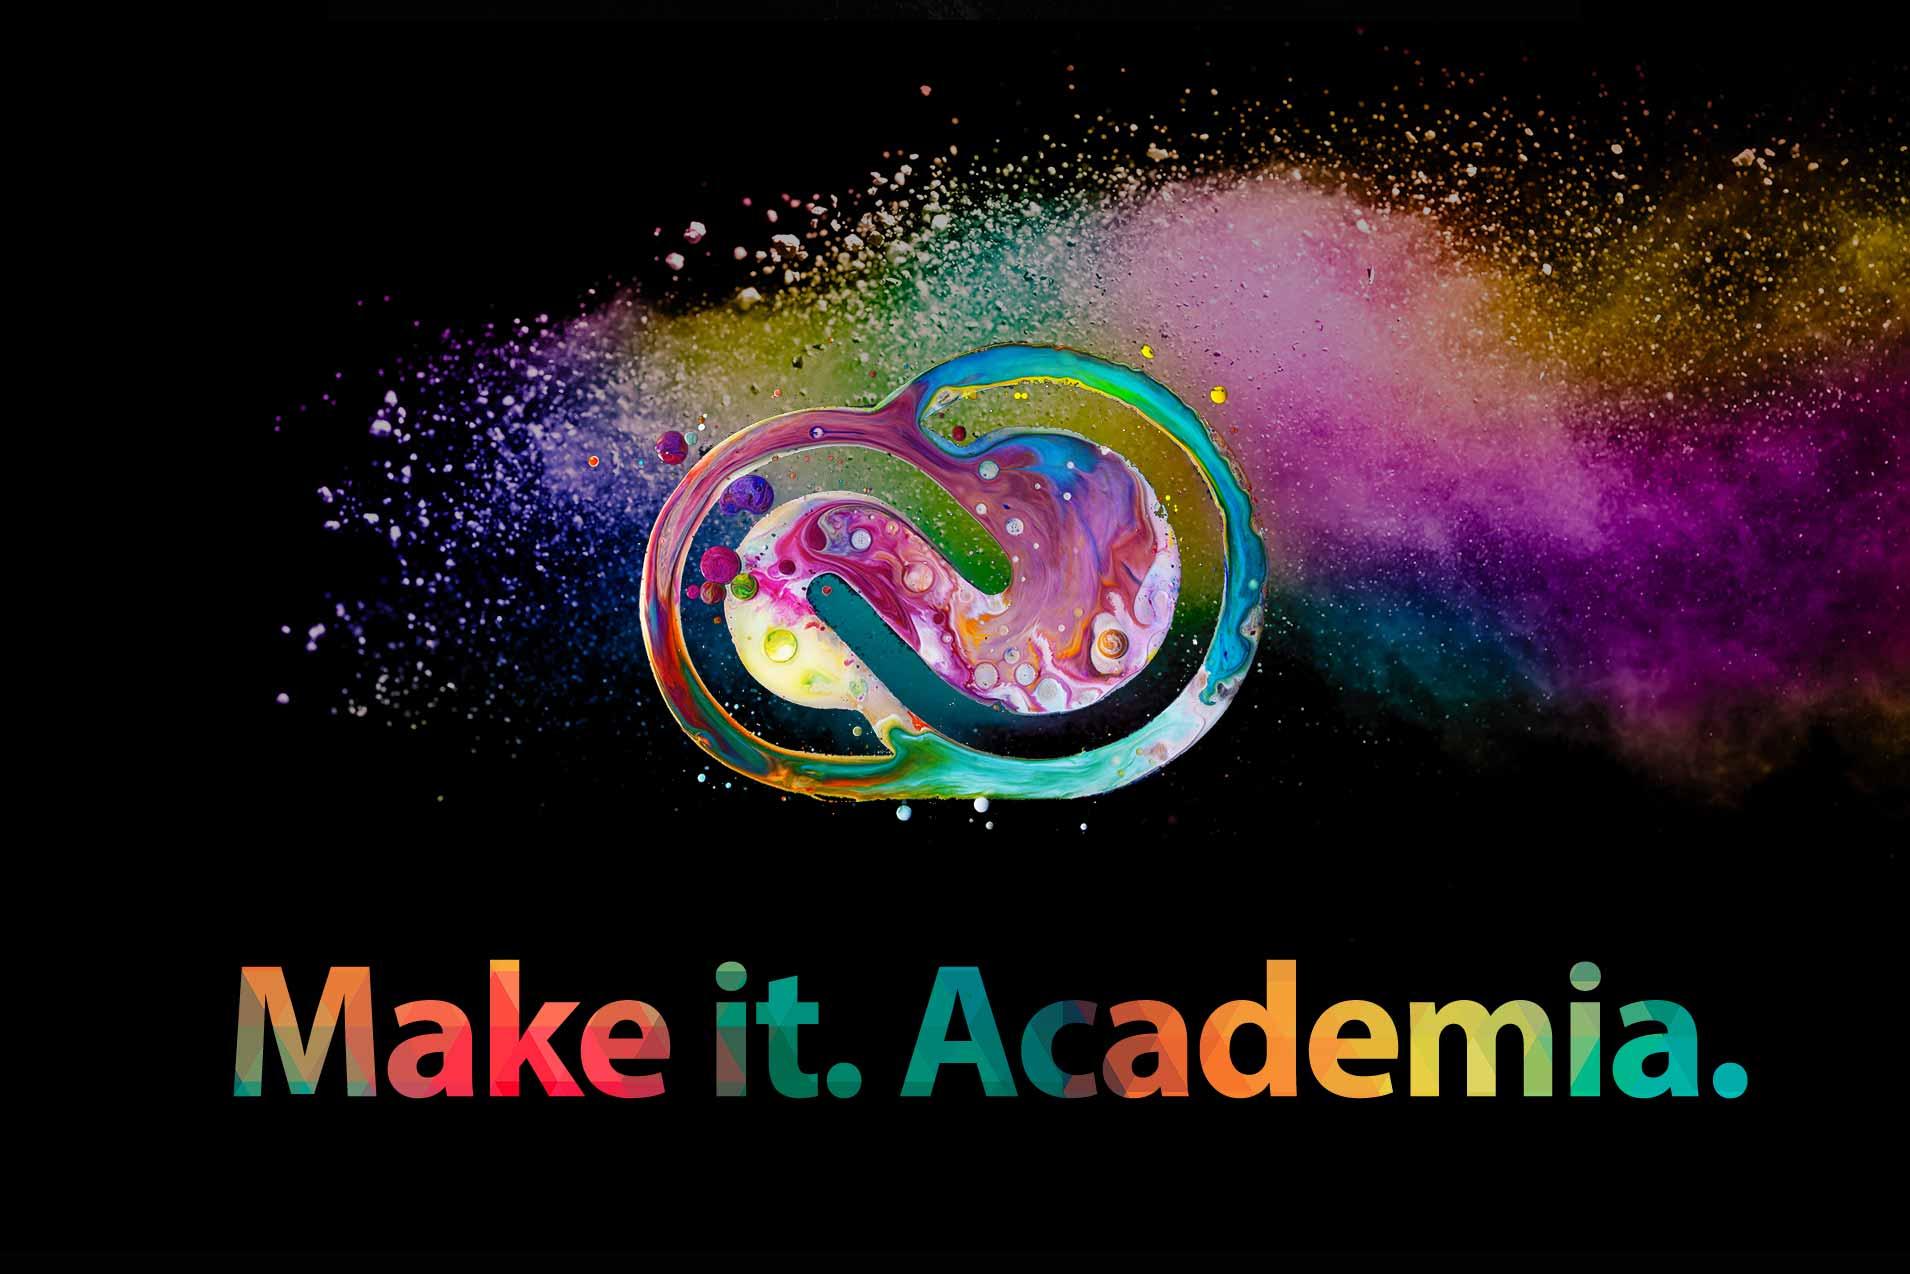 Make it. Academia.